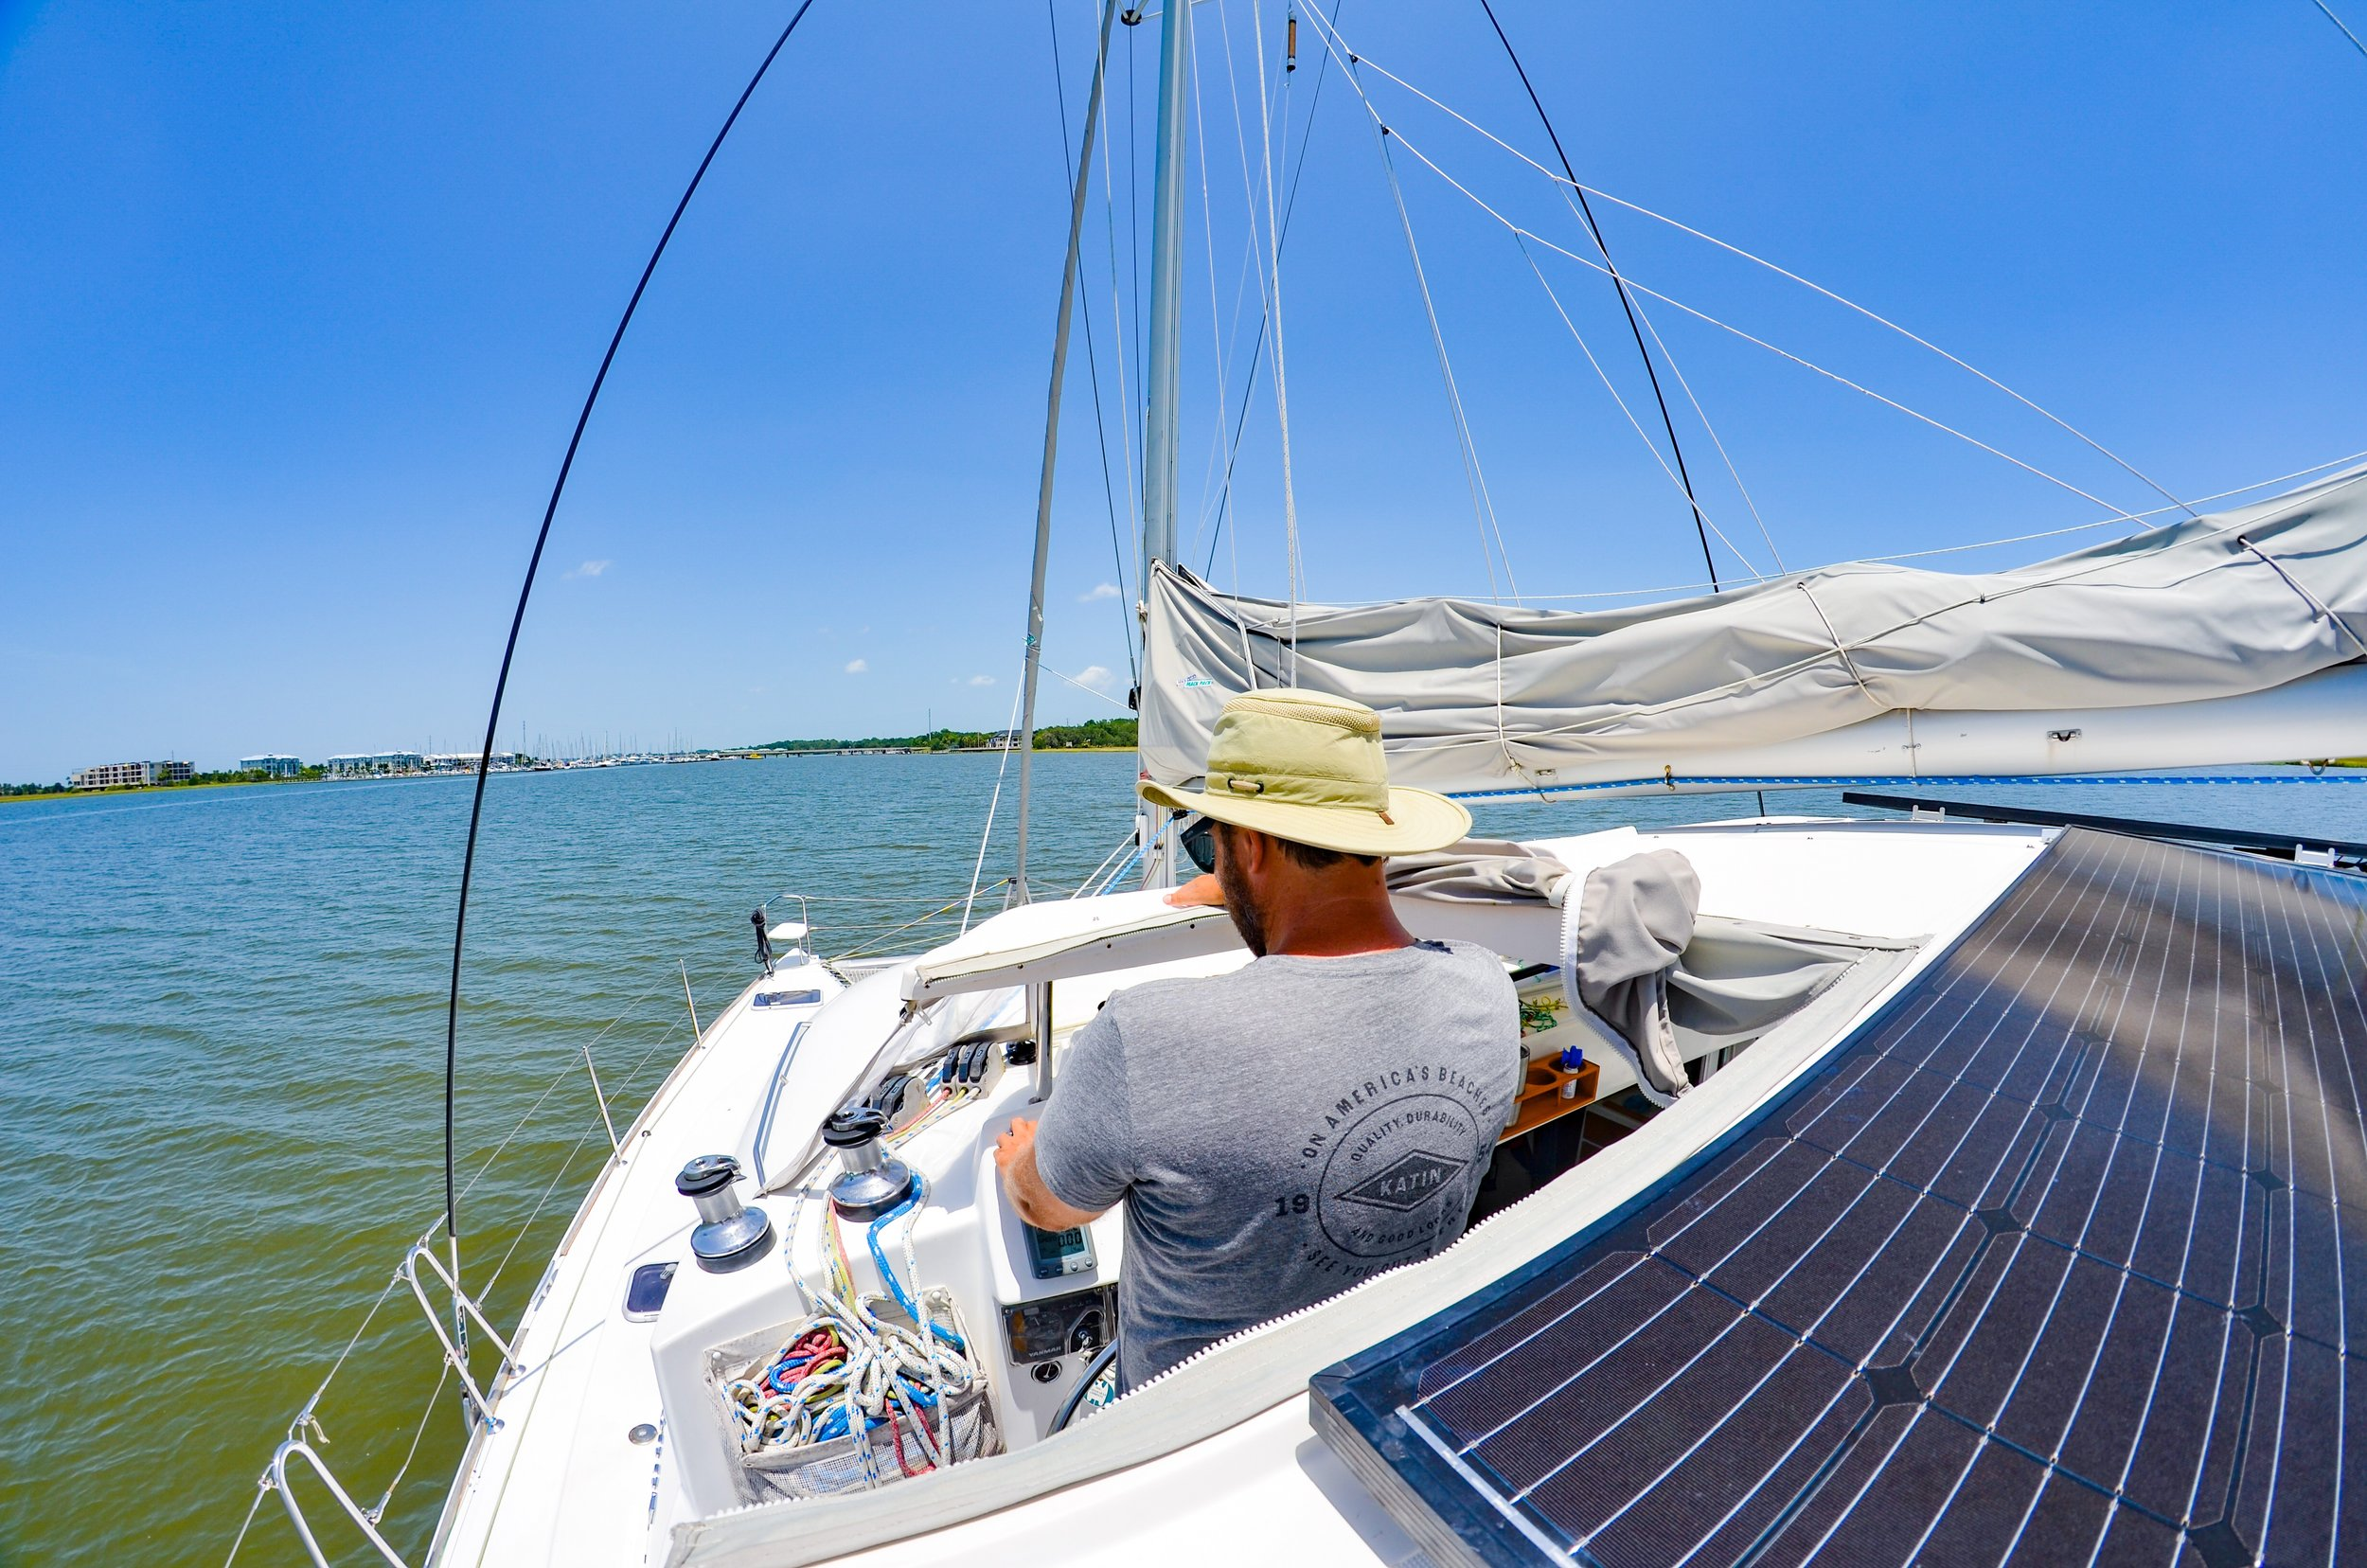 Ross-at-the-Sailboat-Helm.JPEG